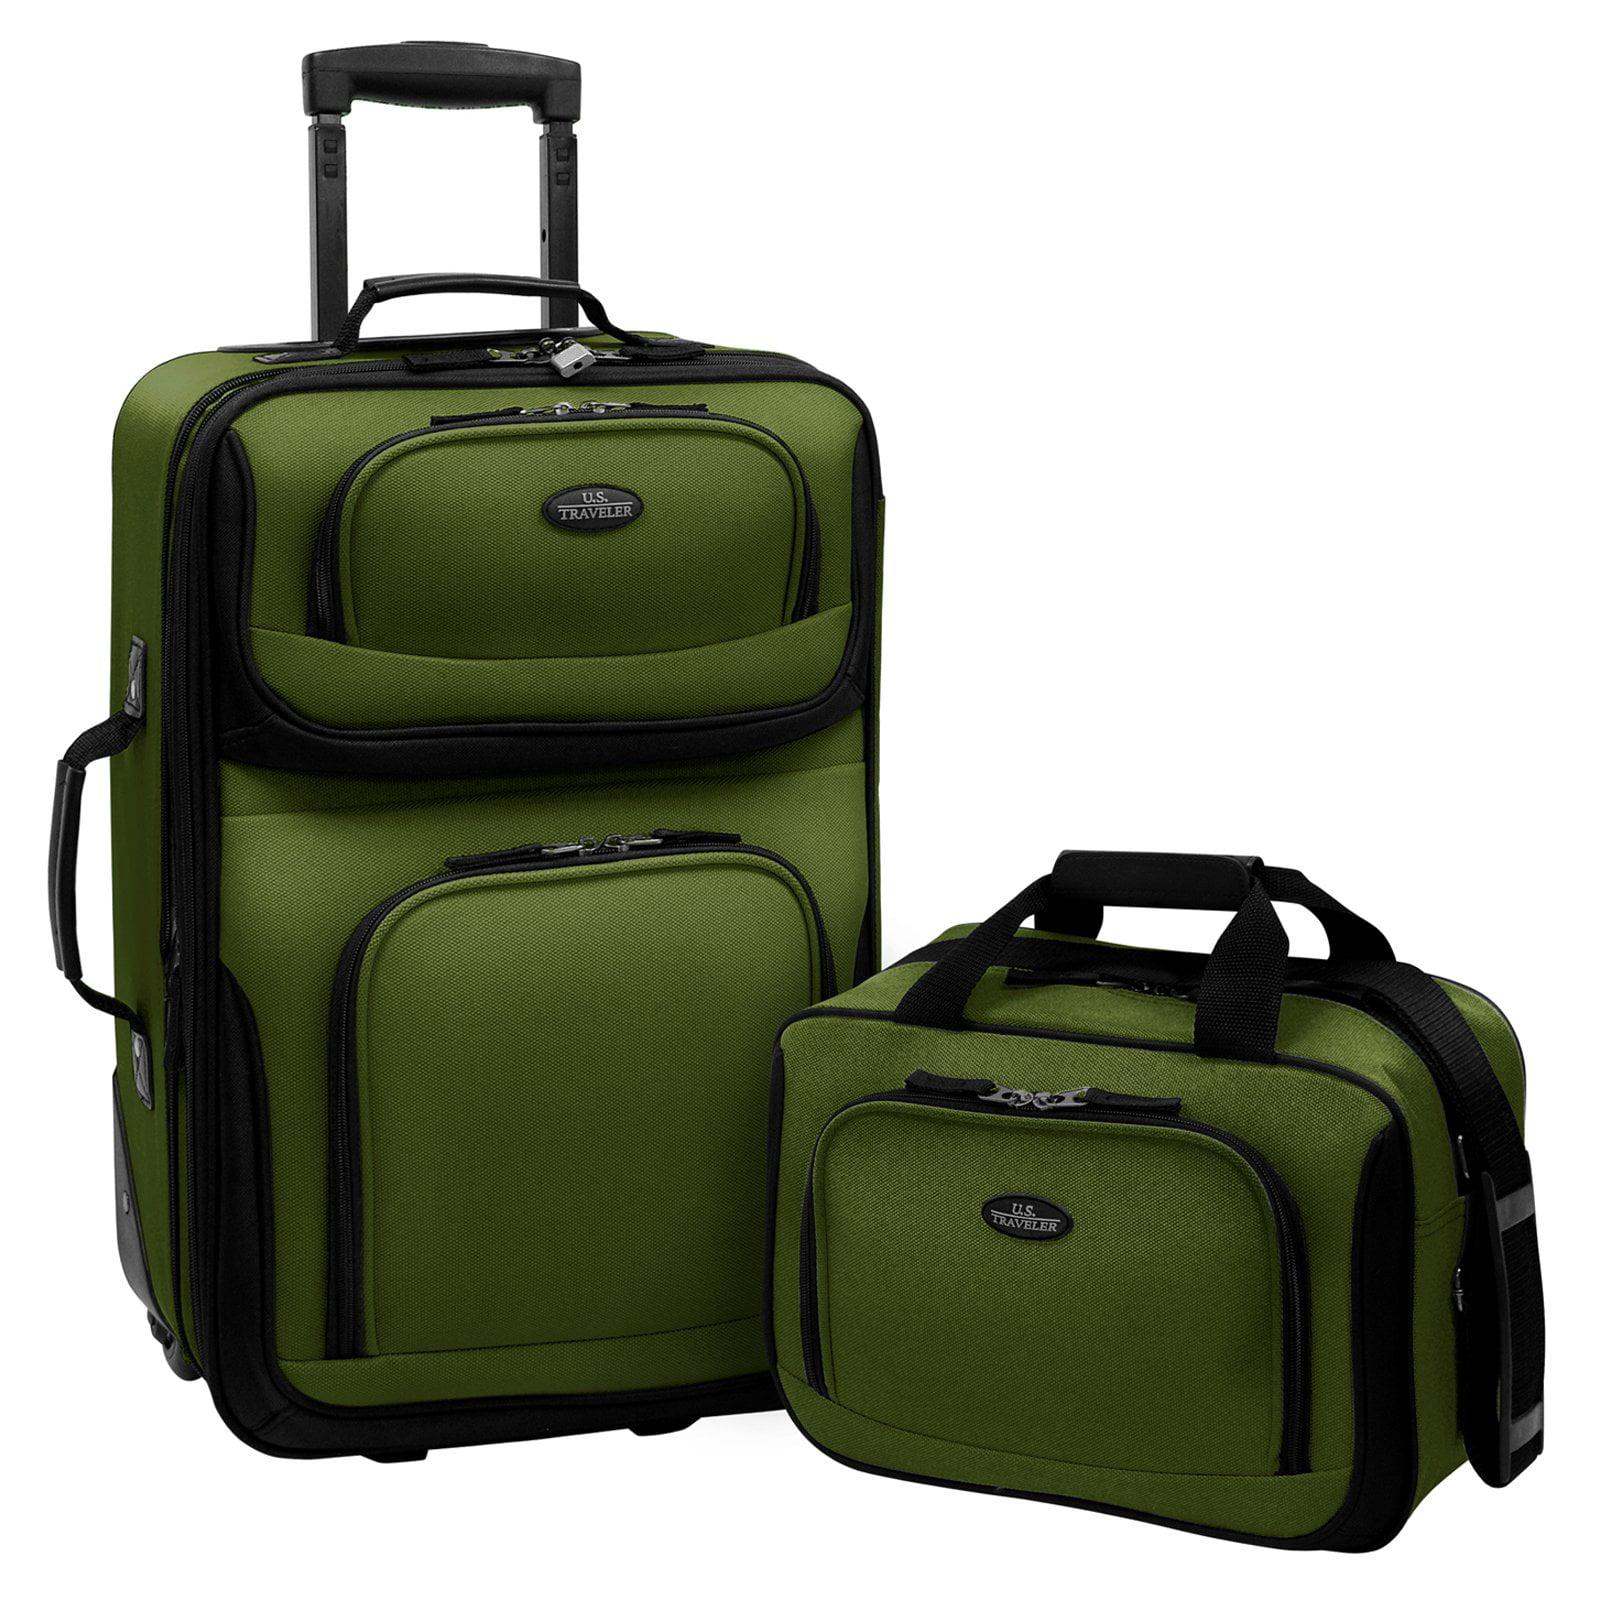 U.S. Traveler Rio 2-Piece Carry-On Luggage Set, Multiple Colors ...